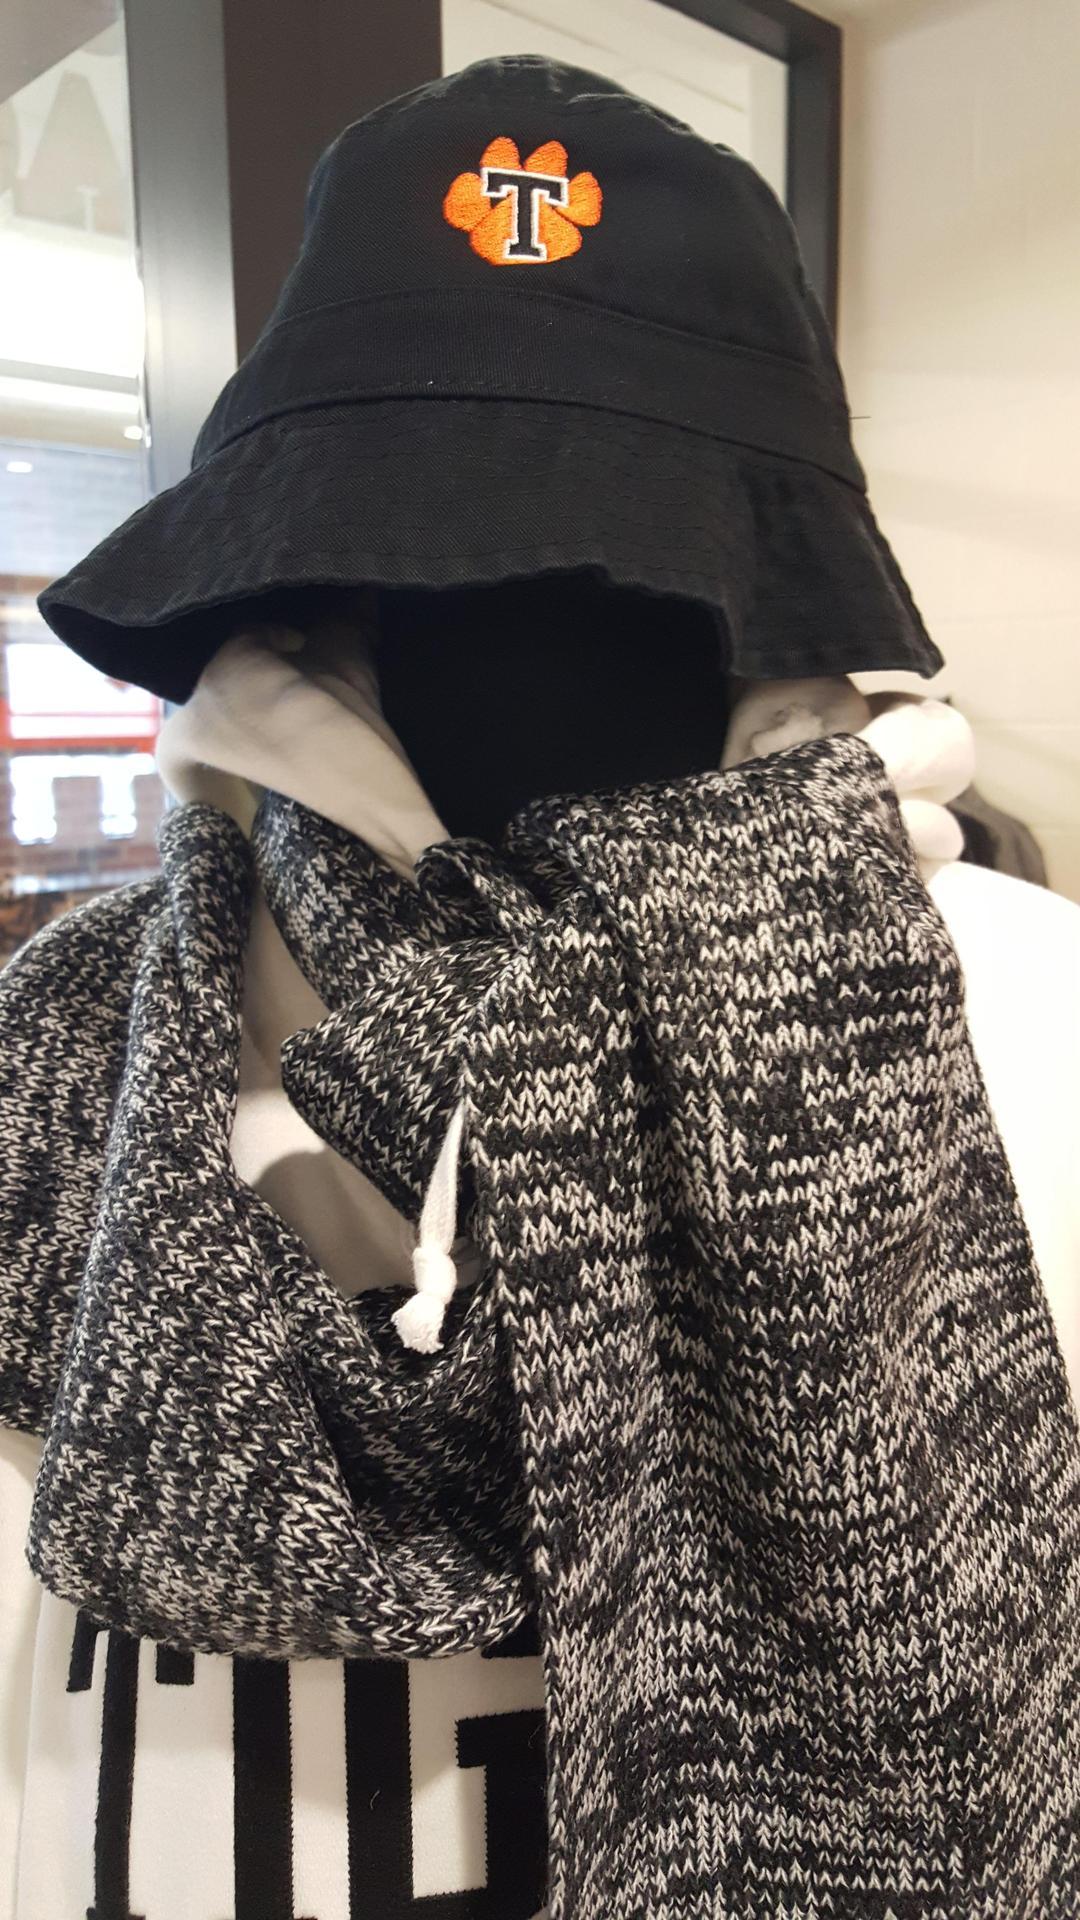 $25.00   Black Twill Bucket Hat  Black w/ Orange Paw  White w/ Orange Paw  SM/MED  Large/XL